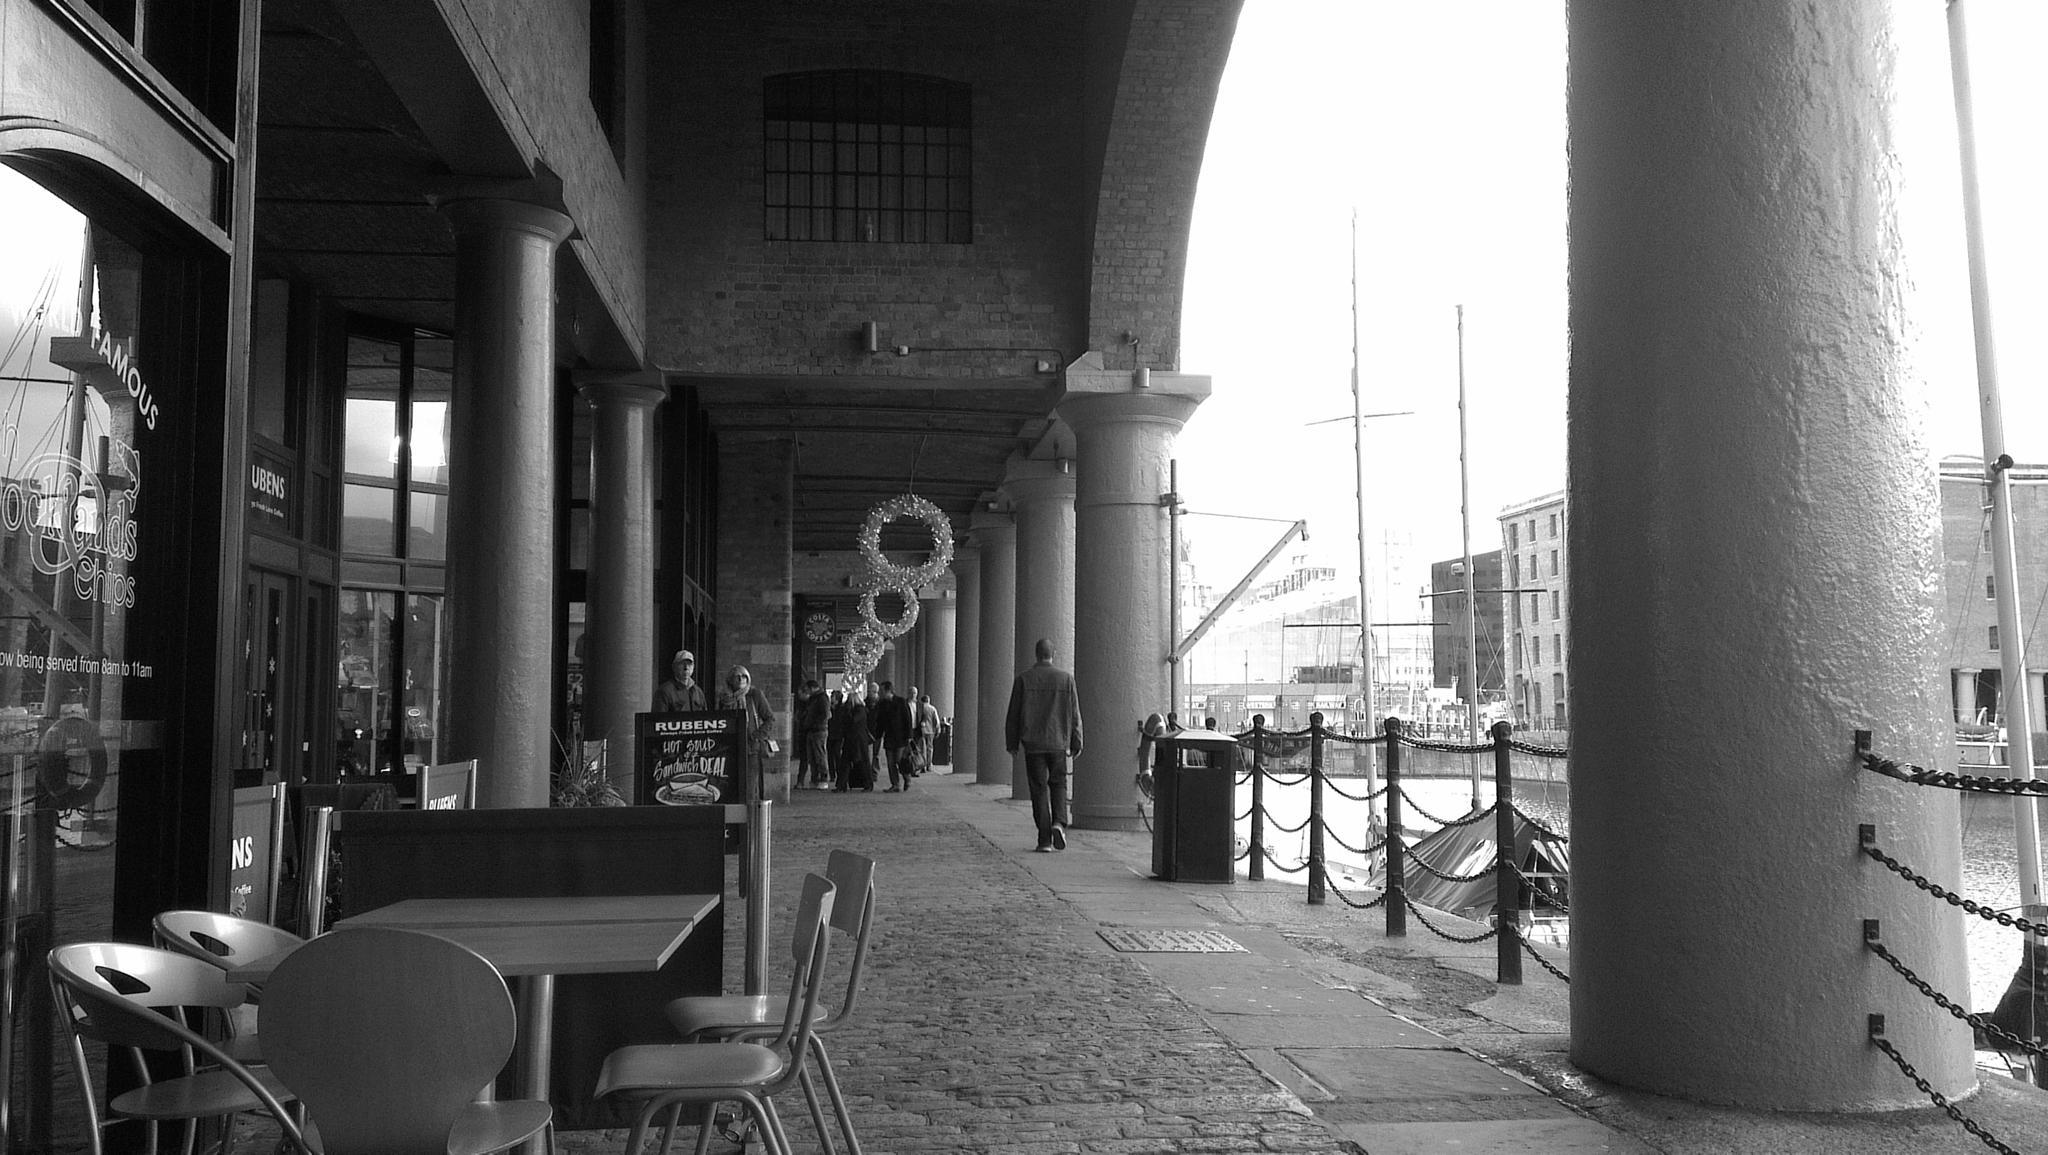 Albert Dock by keve E